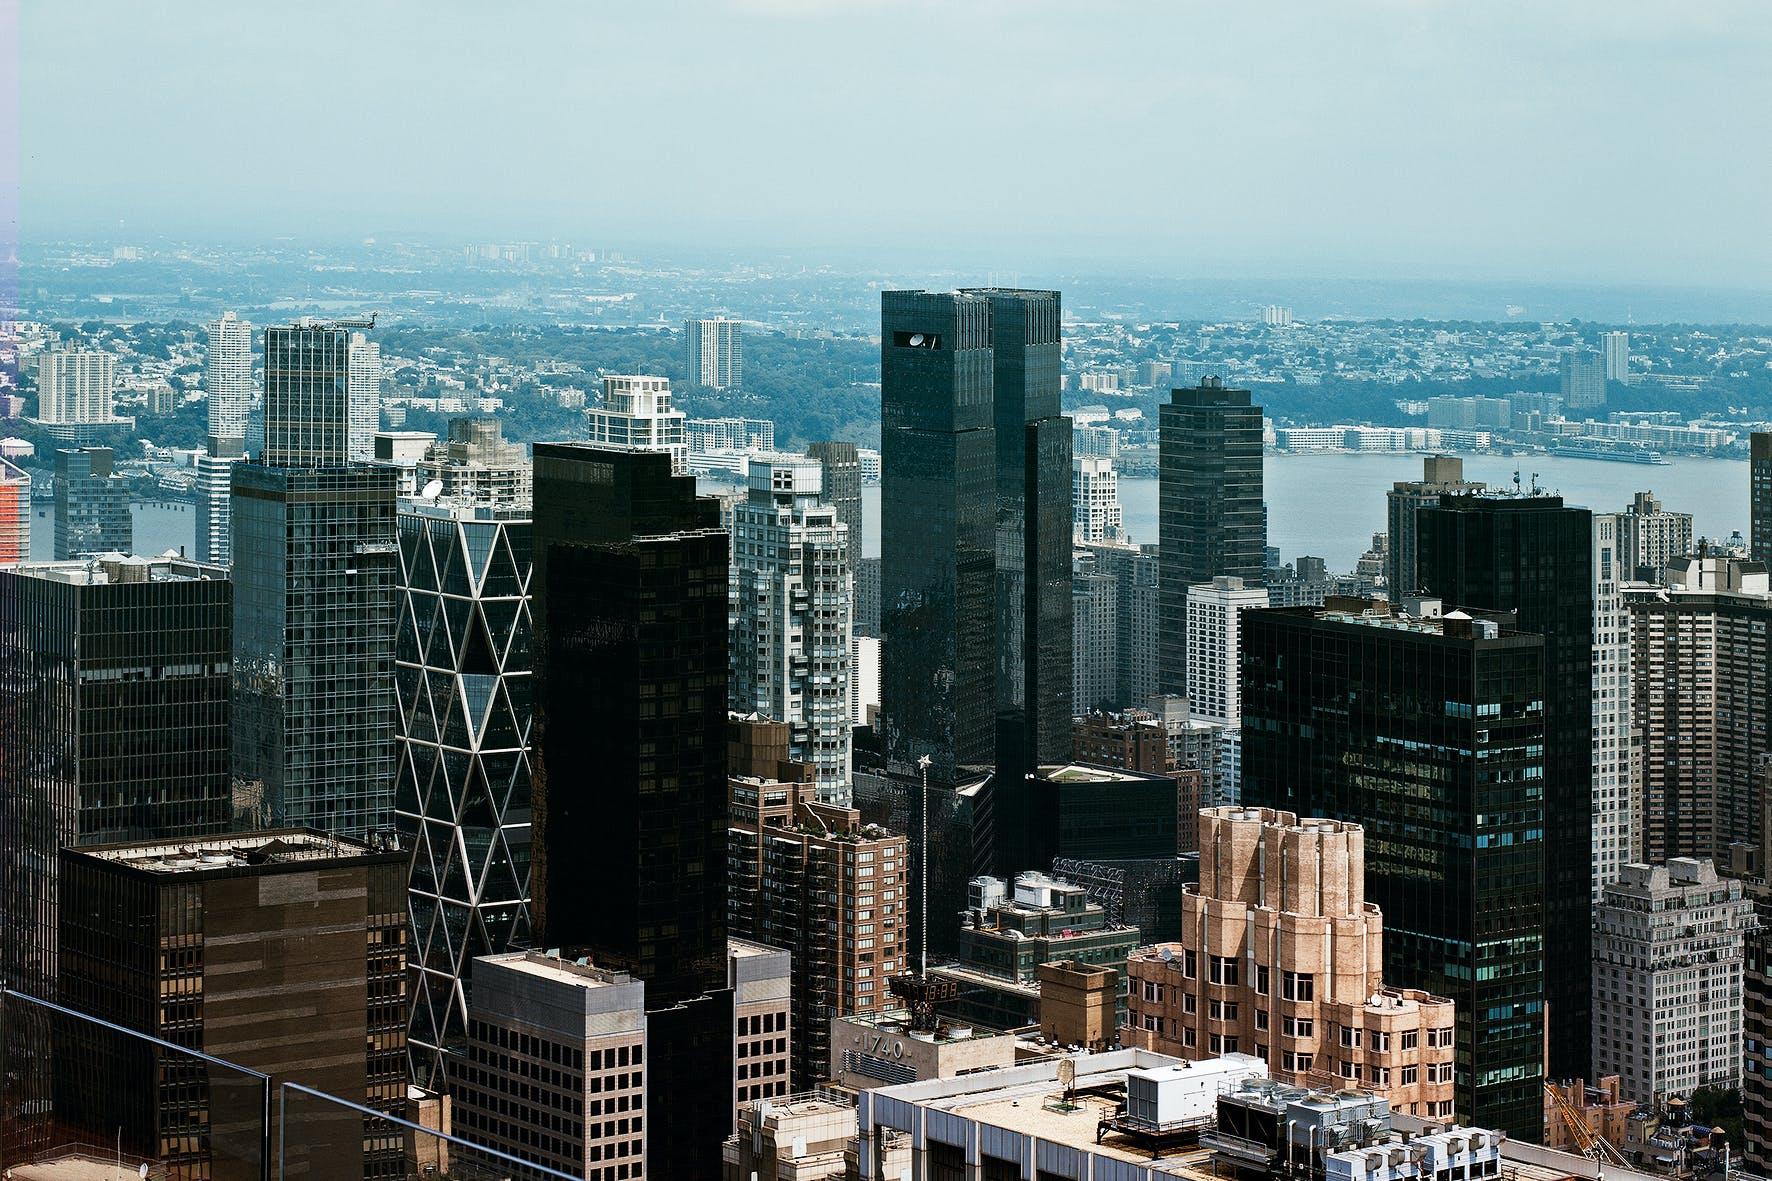 Aerial Photo of Buildings Under Blue Sky